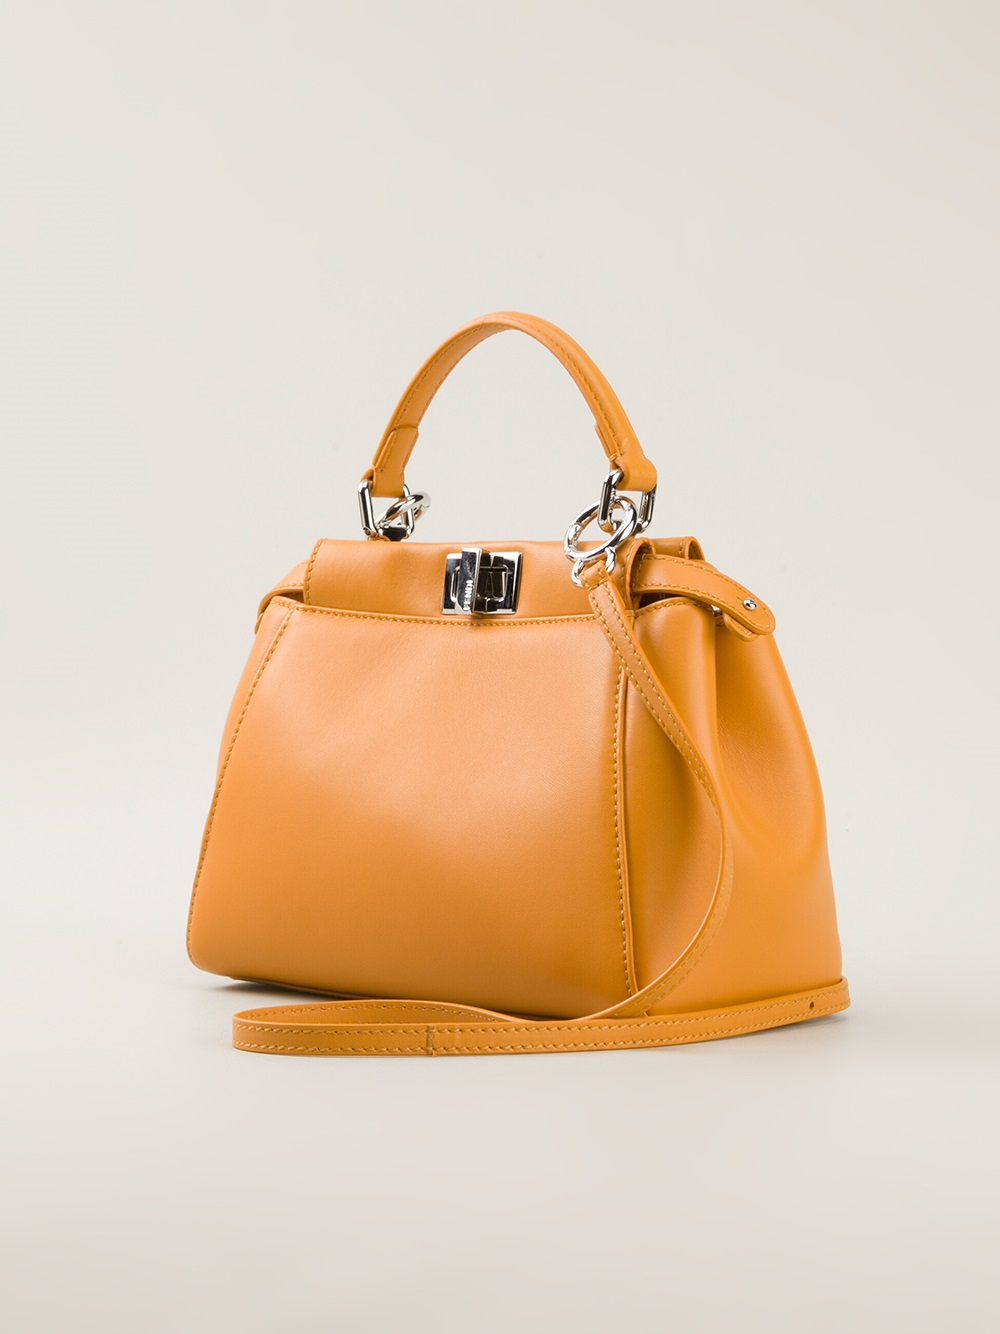 ... clearance fendi peekaboo small tote bag in yellow lyst 8f3a6 e1846 ... 6d8a8ff988acf